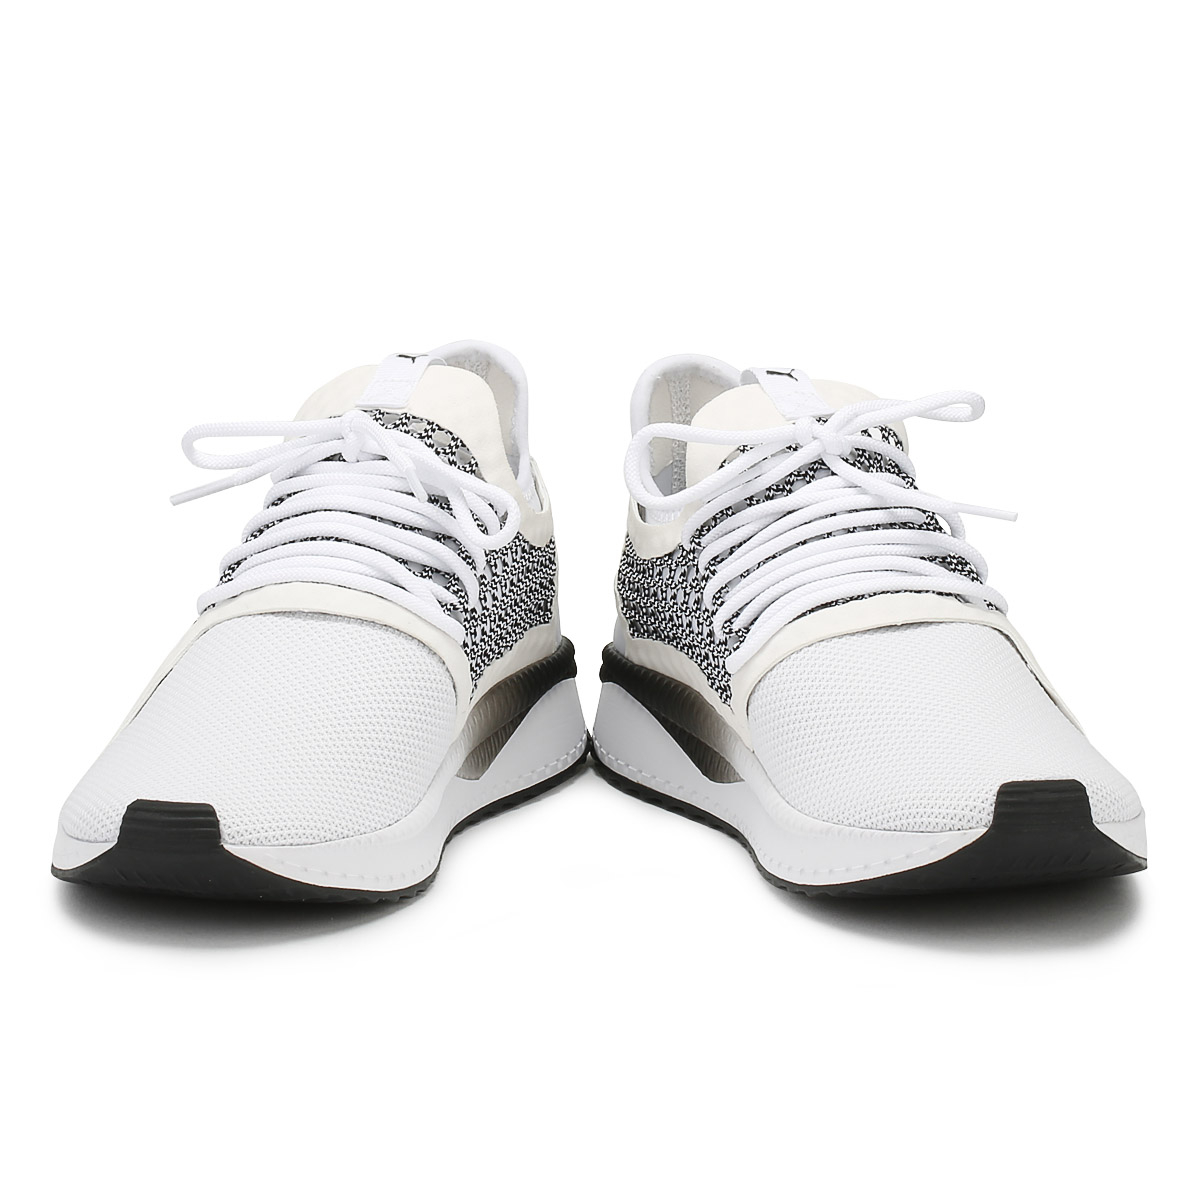 PUMA Mens Trainers Netfit White & Black Tsugi Netfit Trainers v2 Lace Up Sport Running Shoes bea83c